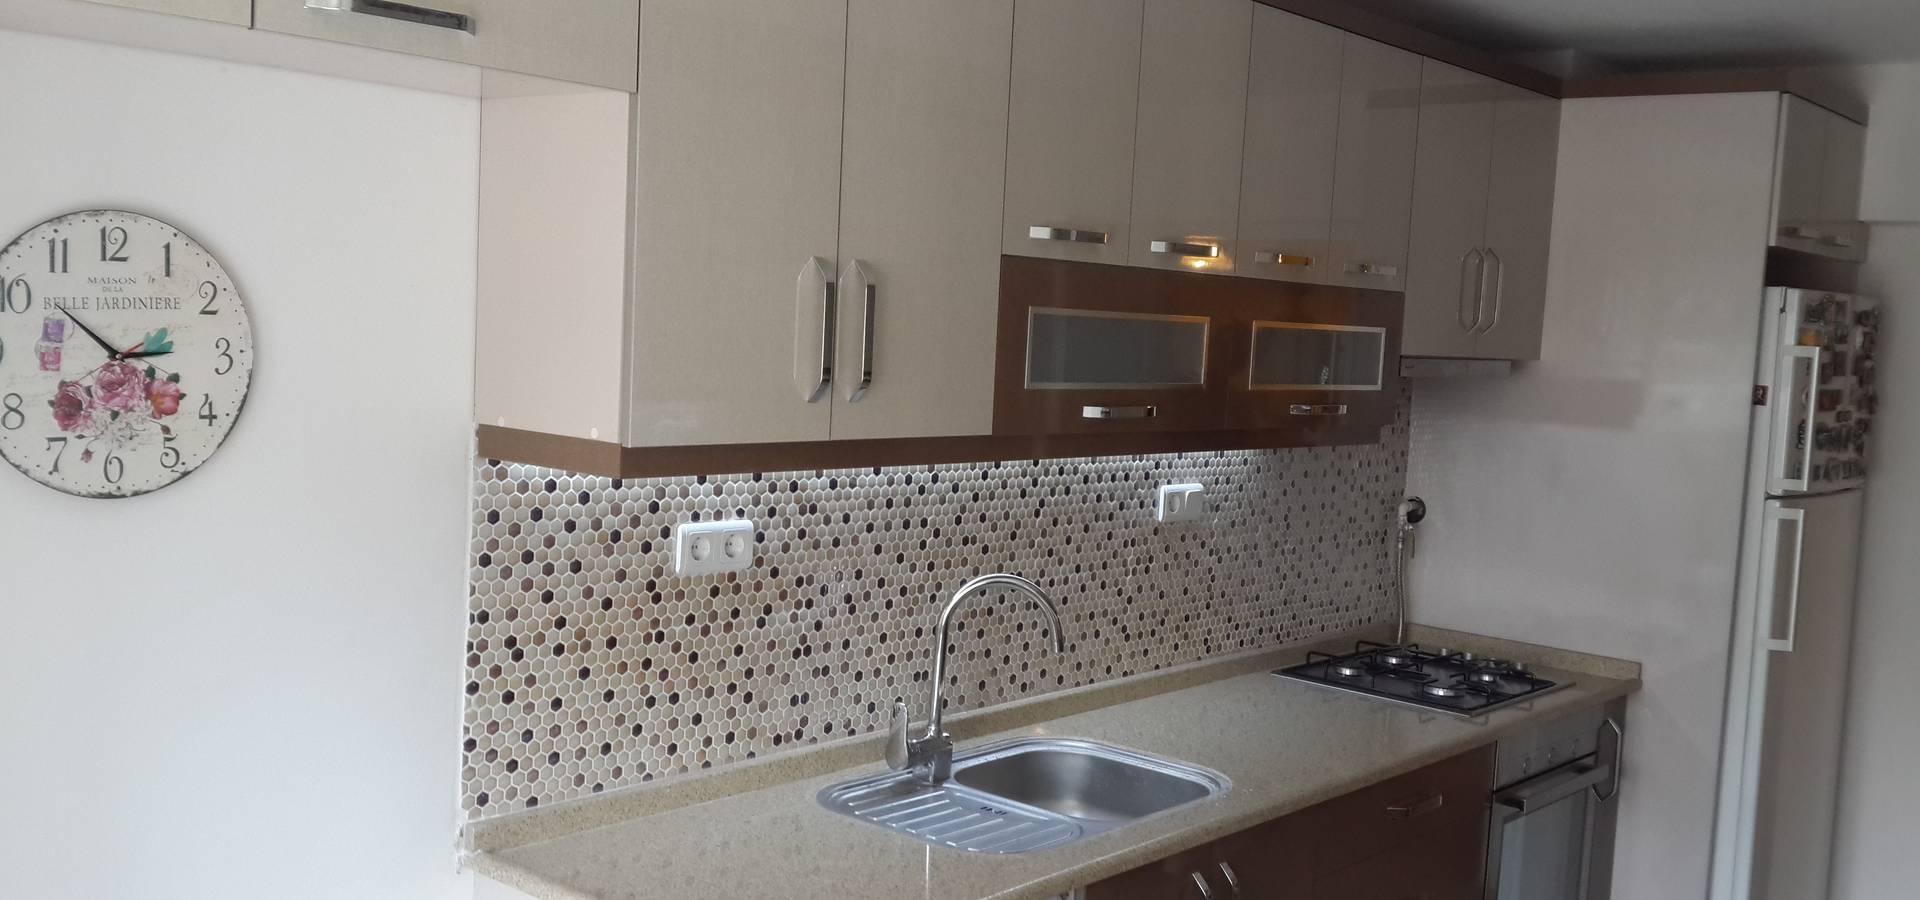 izmir mutfak dekorasyon